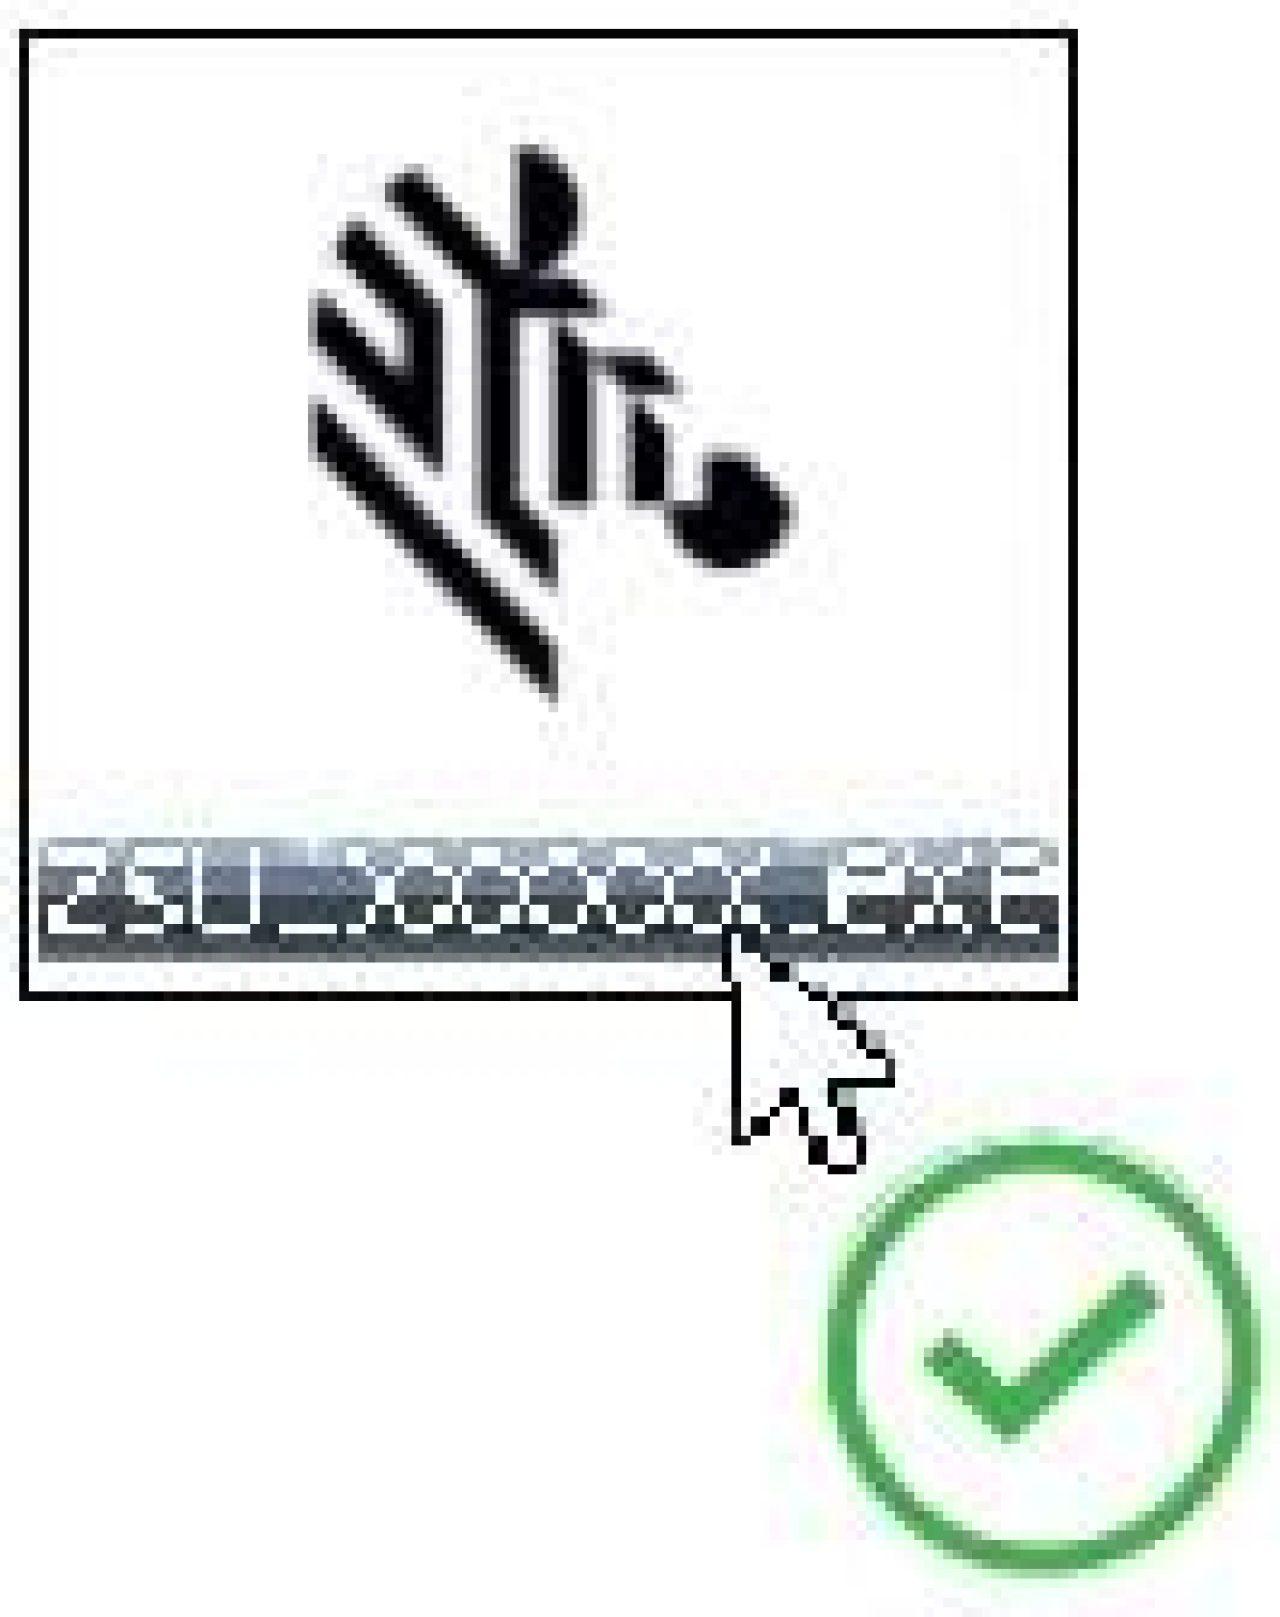 Zebra セットアップ ユーティリティの実行可能ファイルのスクリーン ショット